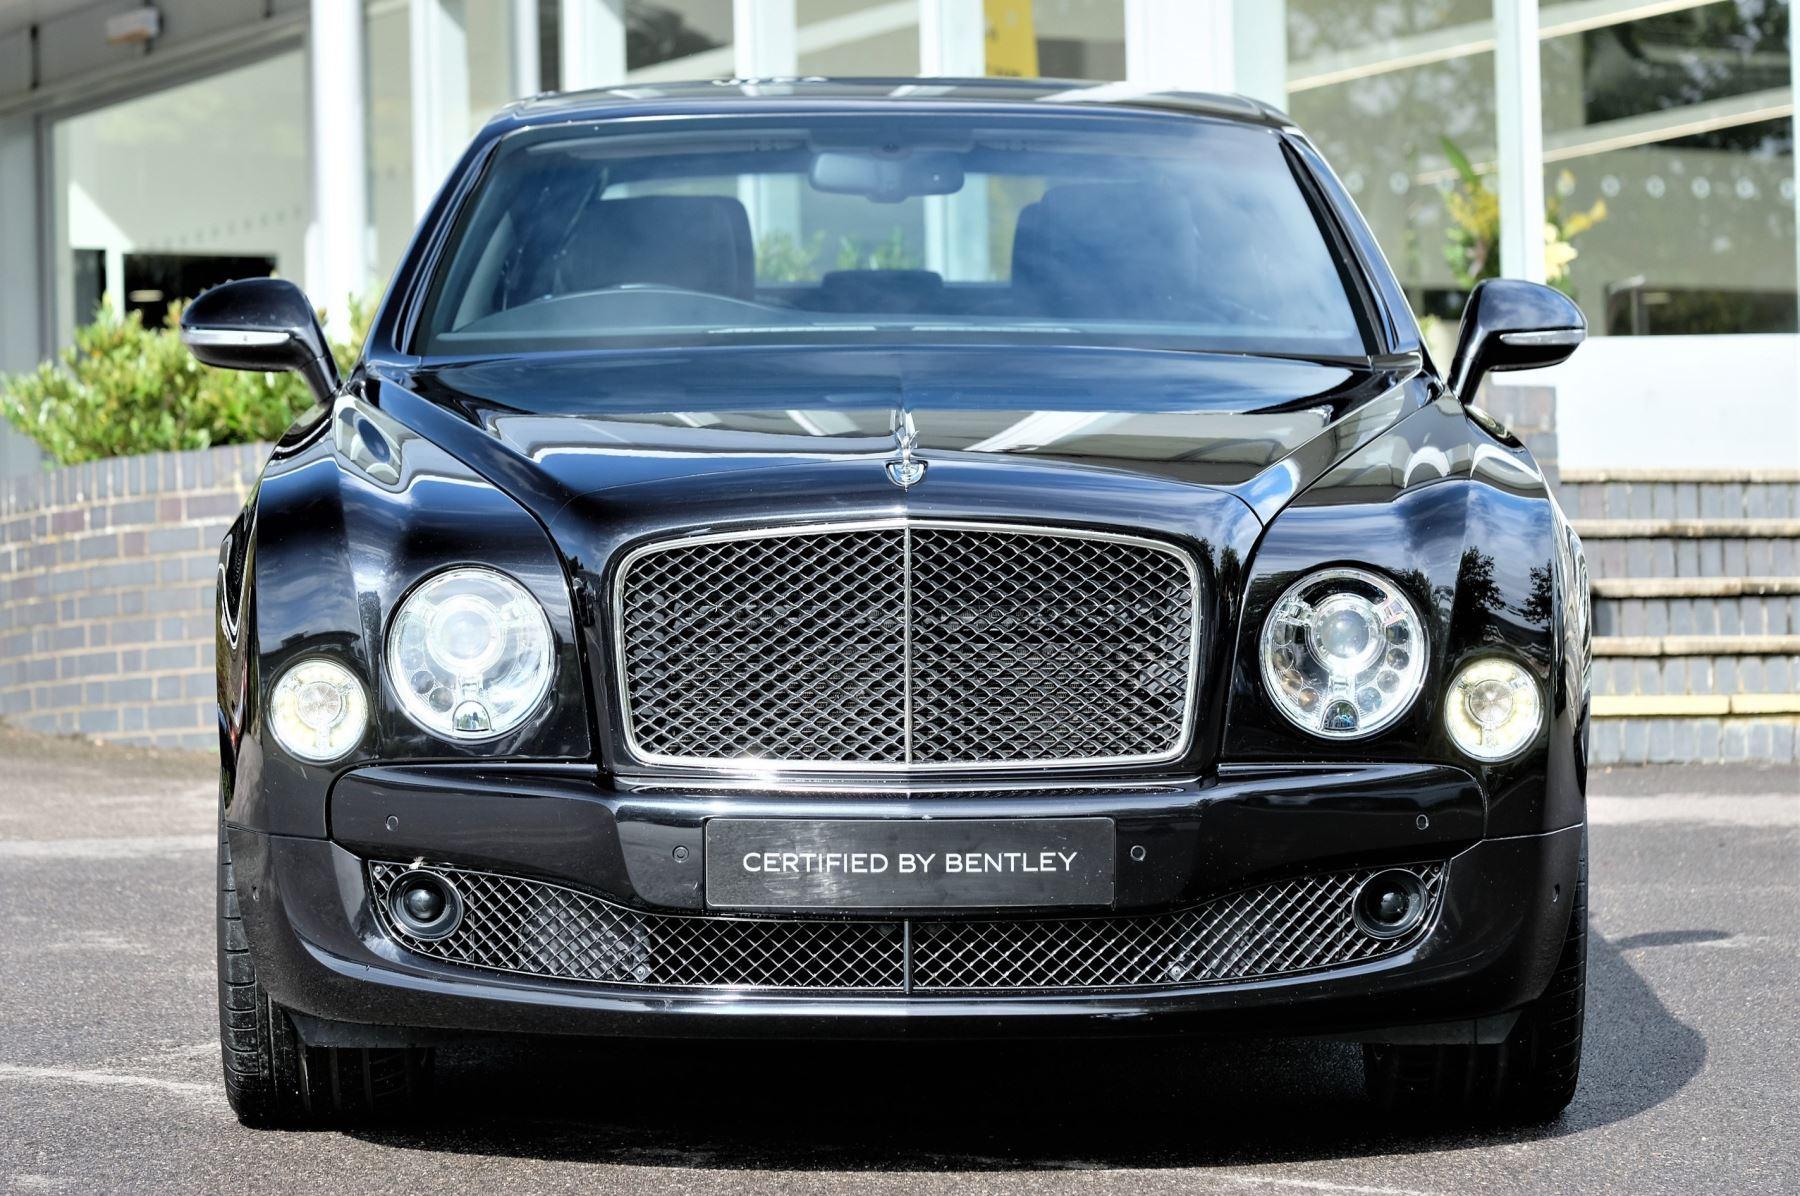 Bentley Mulsanne 6.8 V8 Speed image 2